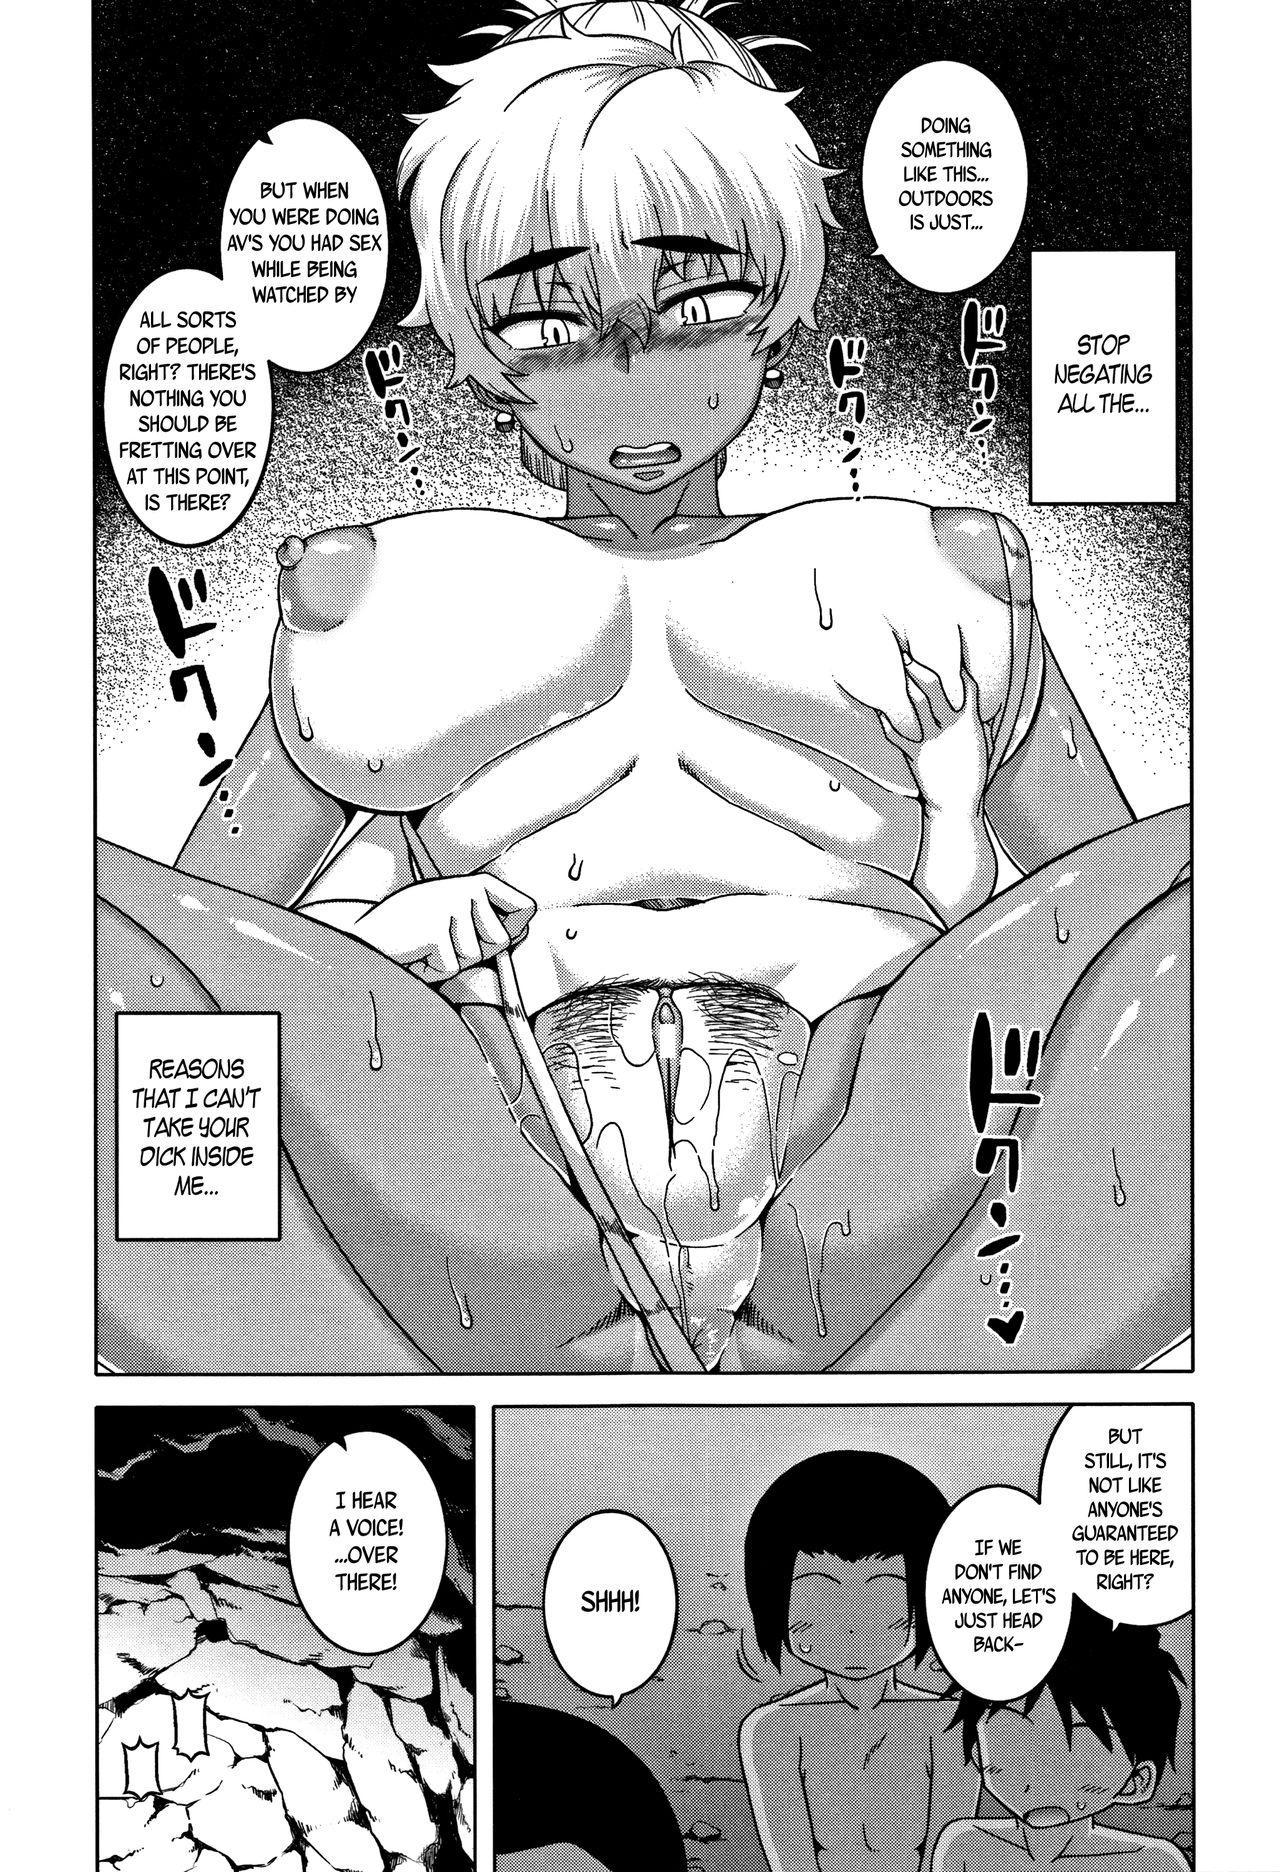 [Takatsu] Hitozuma A-san to Musuko no Yuujin N-kun - Married wife A and son's friend N-kun Ch. 1-3 [English] 61